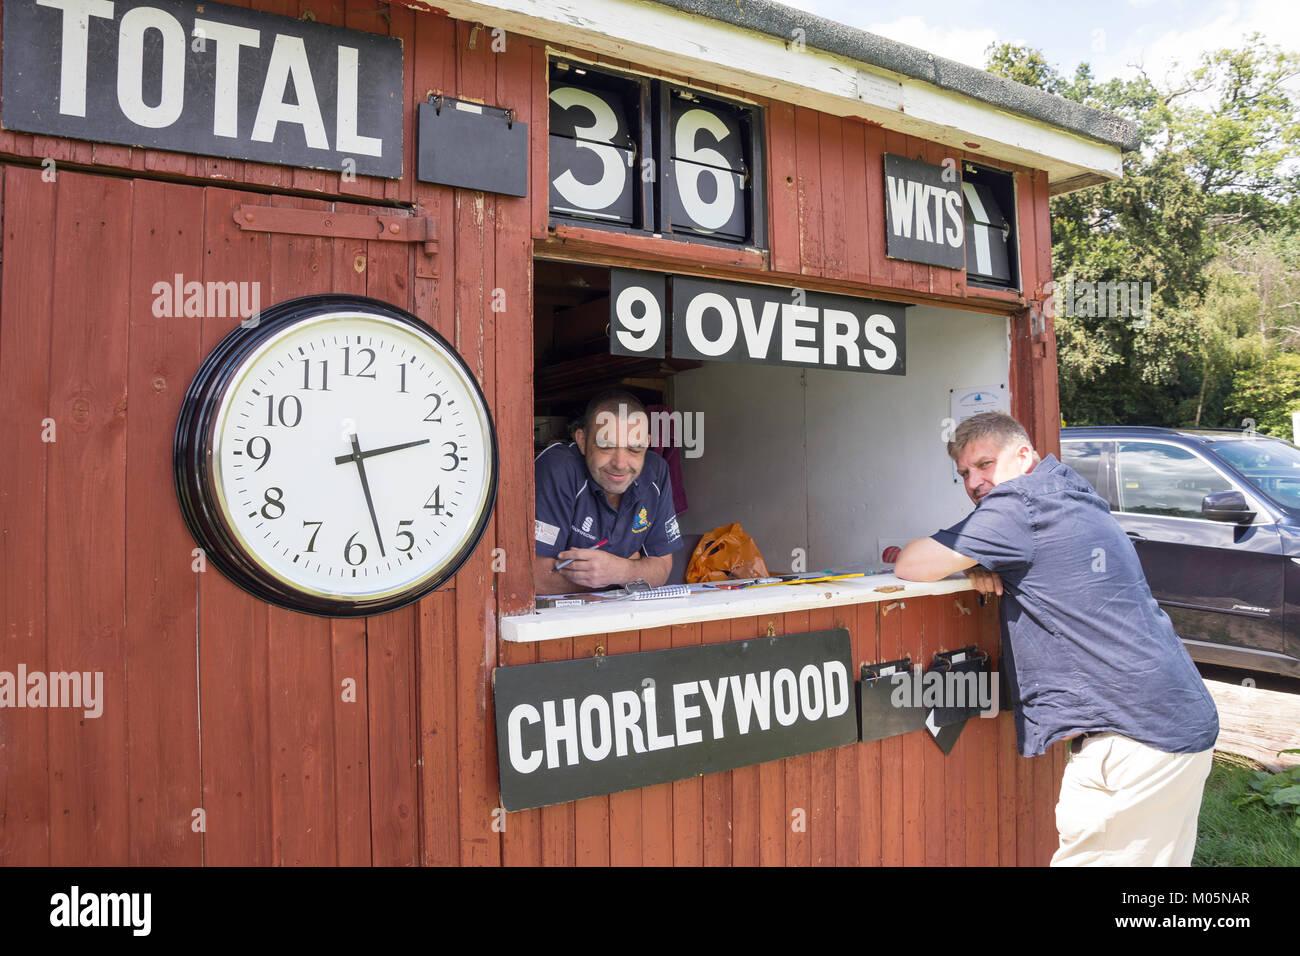 Scoring shed at Saturday match at Chorleywood Cricket Club, Chorleywood, Hertfordshire, England, United Kingdom Stock Photo